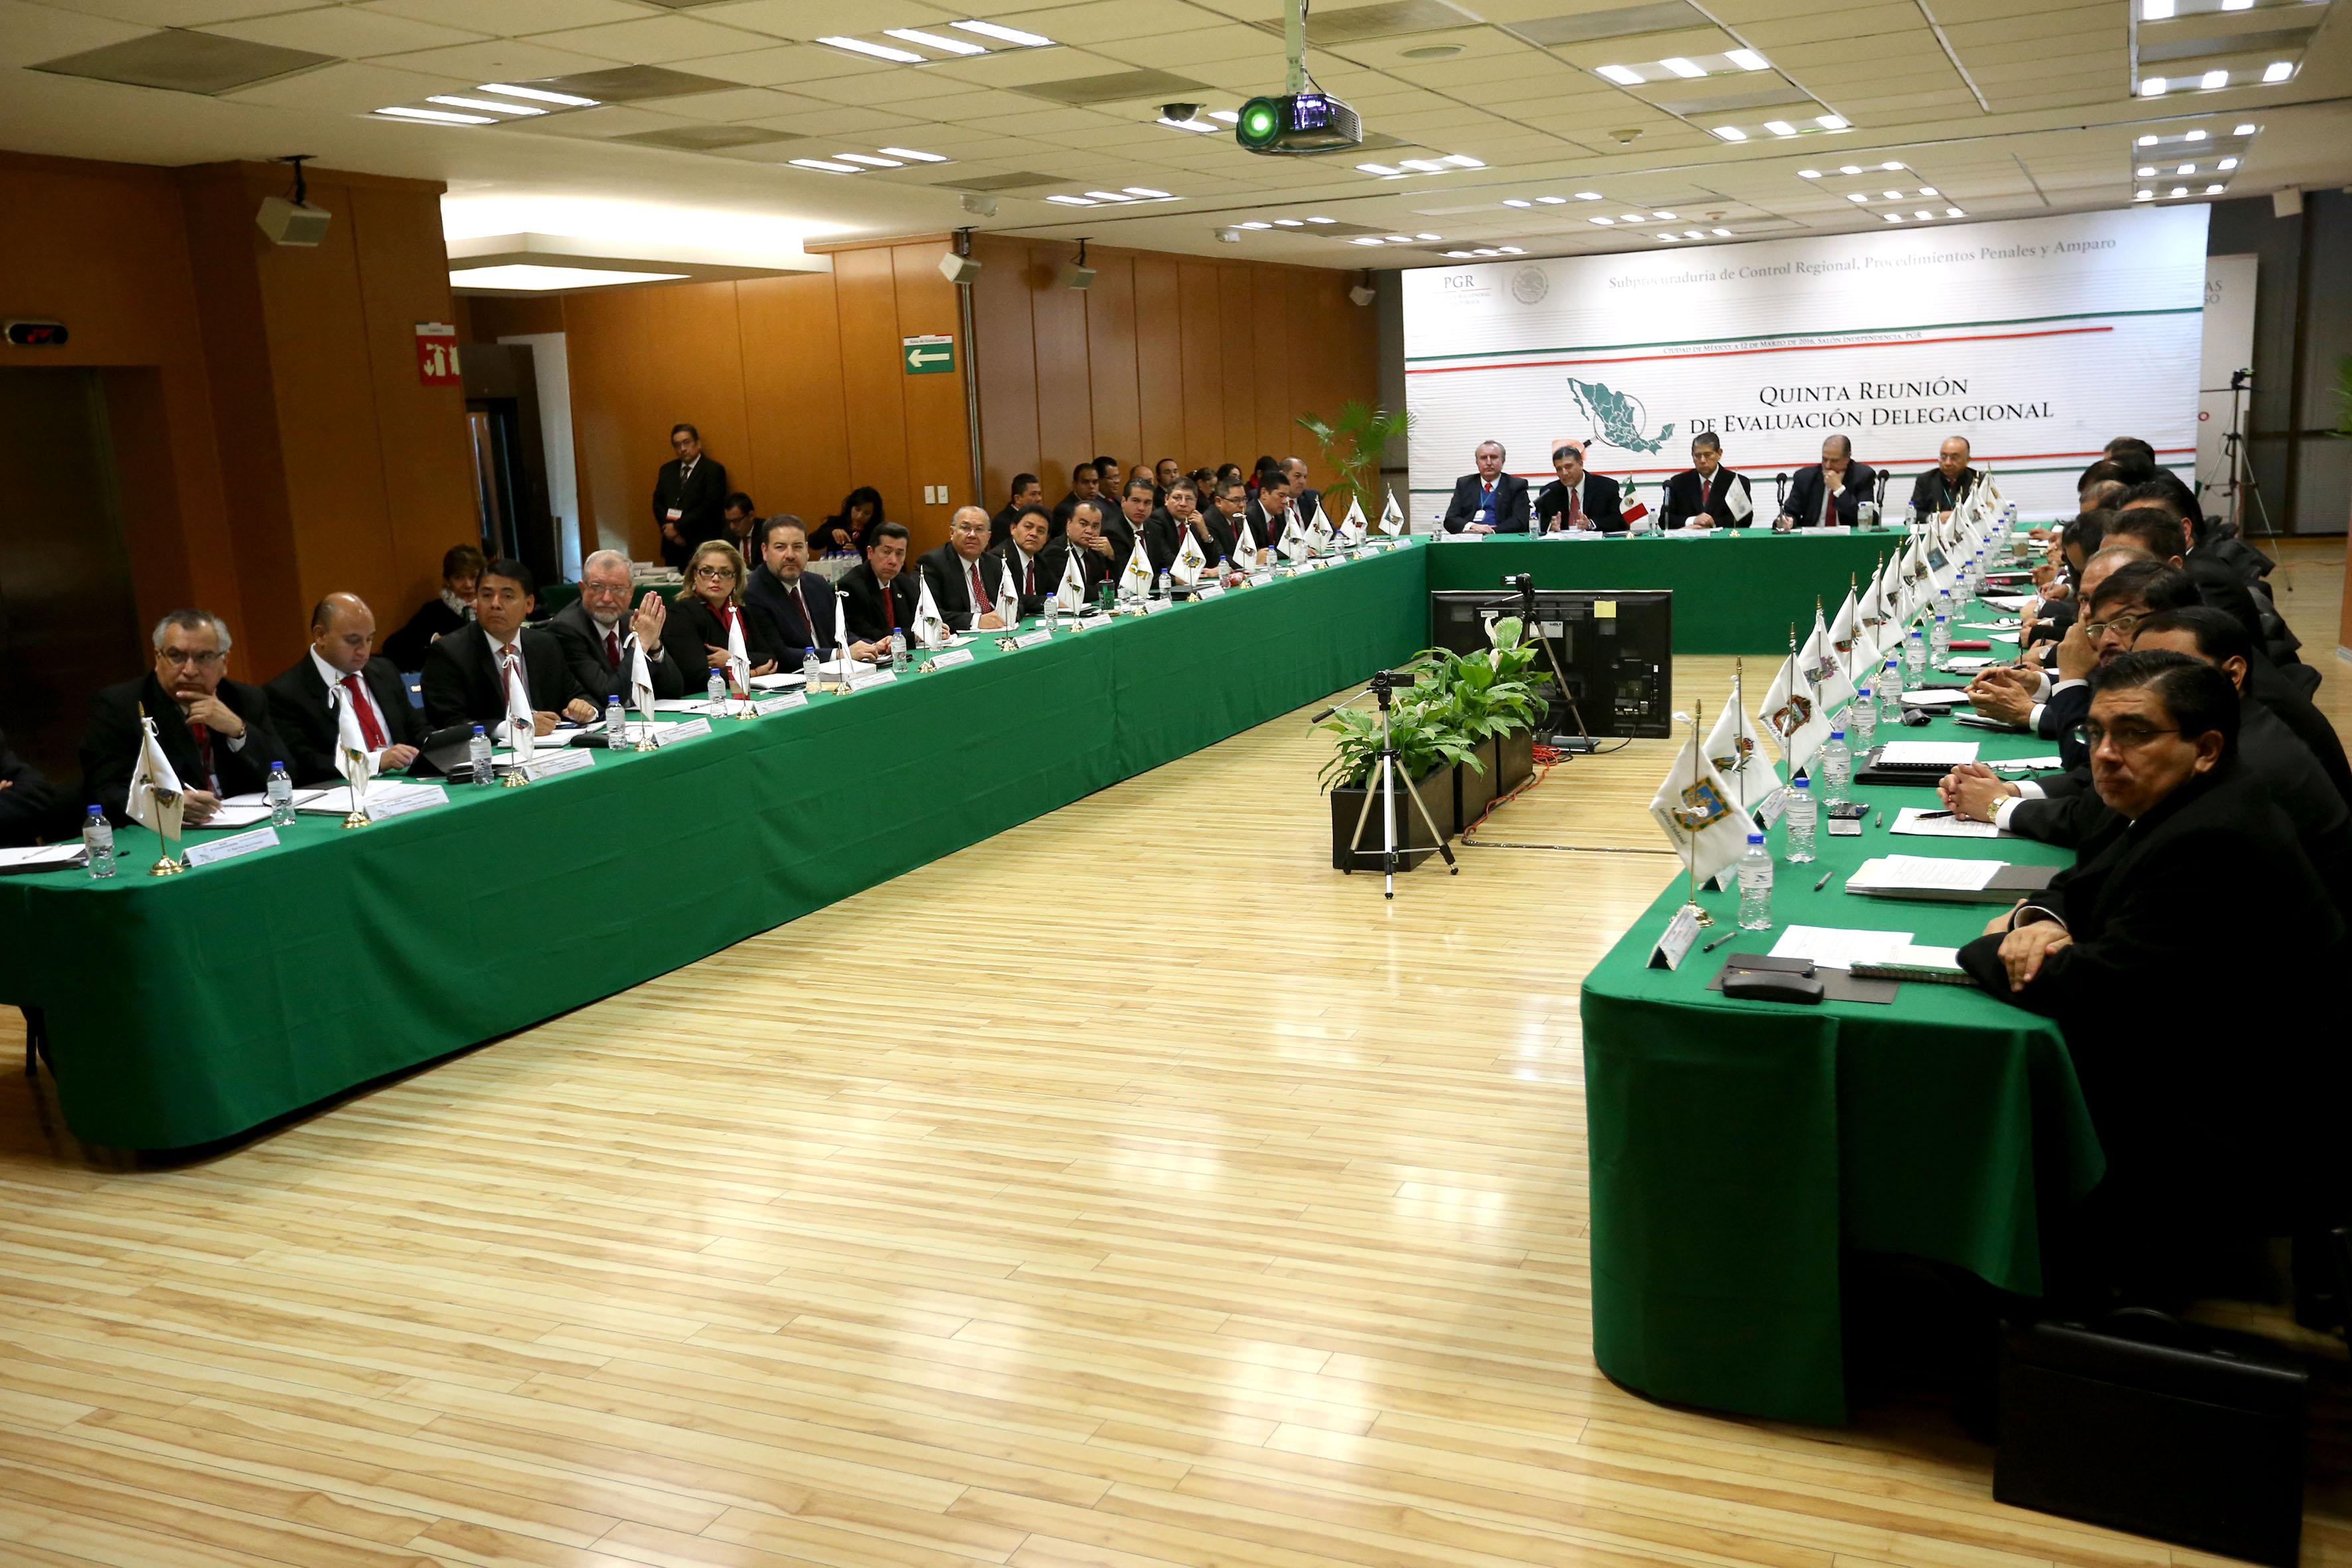 12 03 16 5a Reunio n delegacional PGR15.jpg